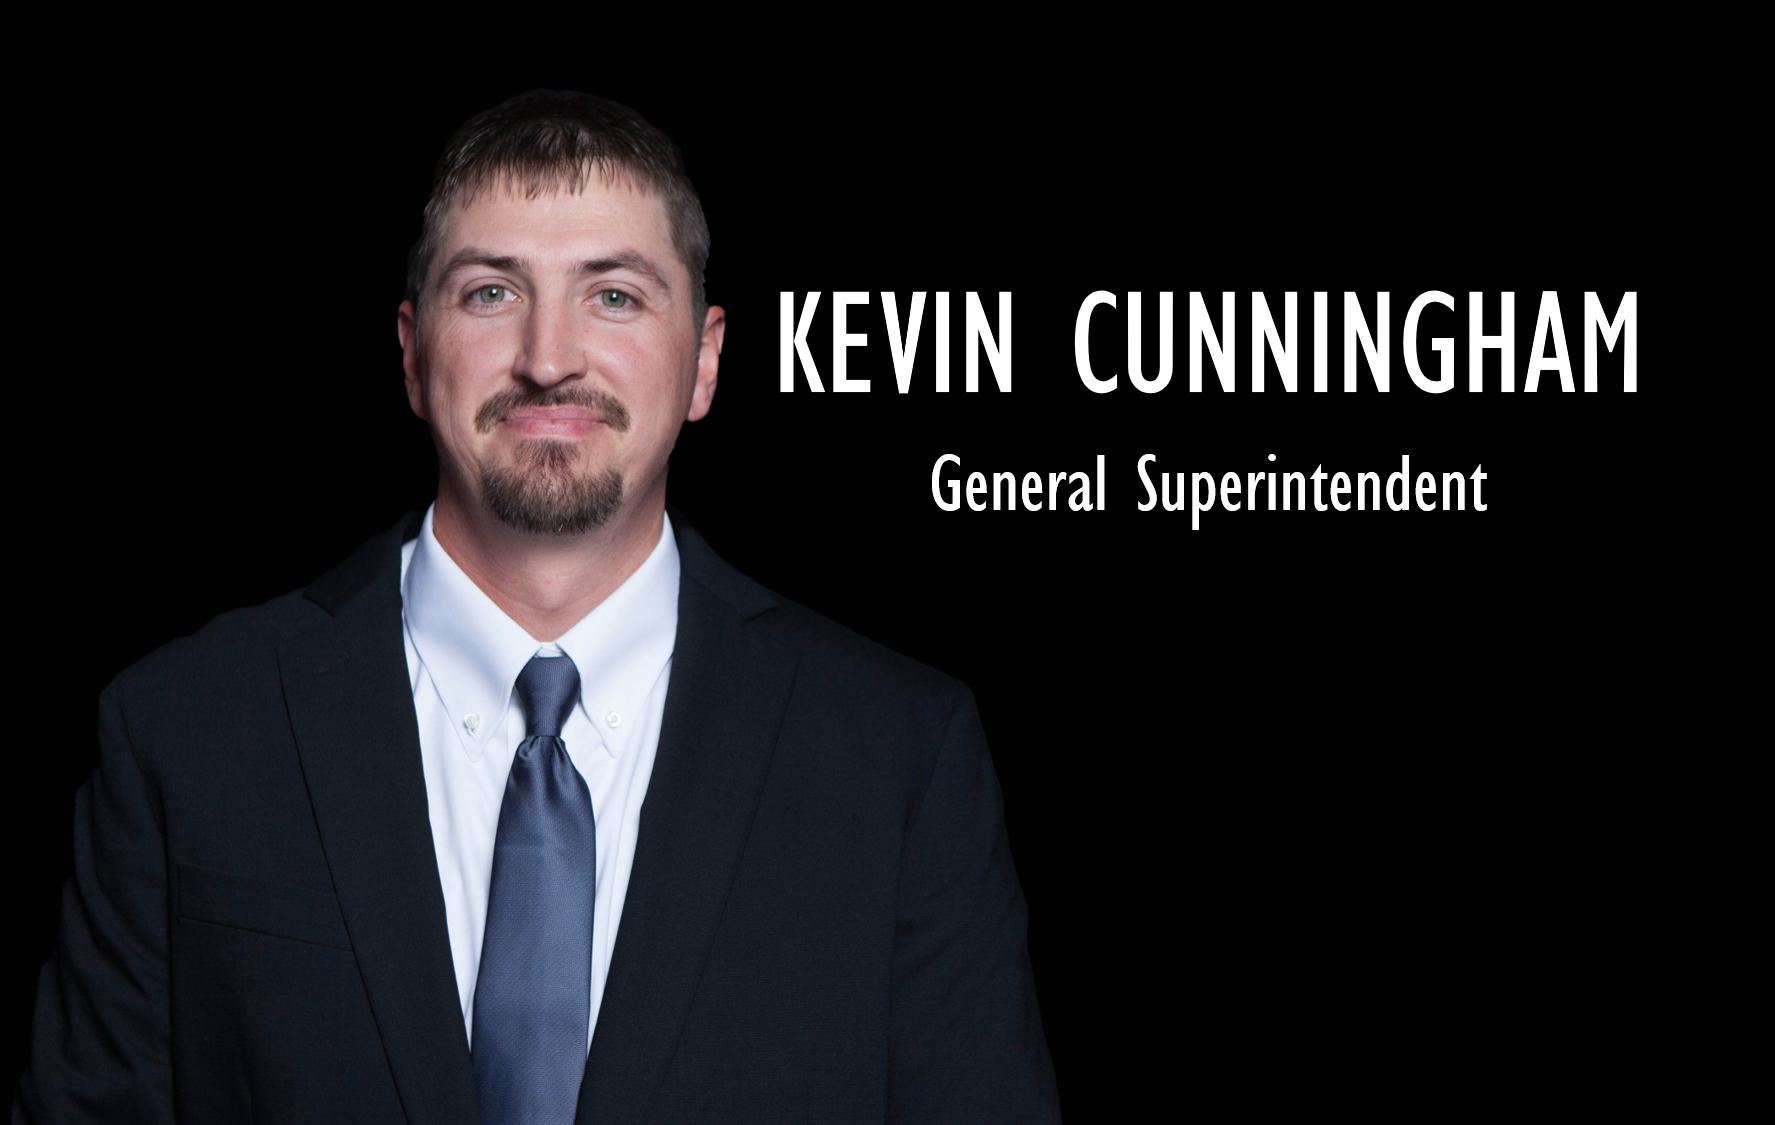 Kevin Cunningham